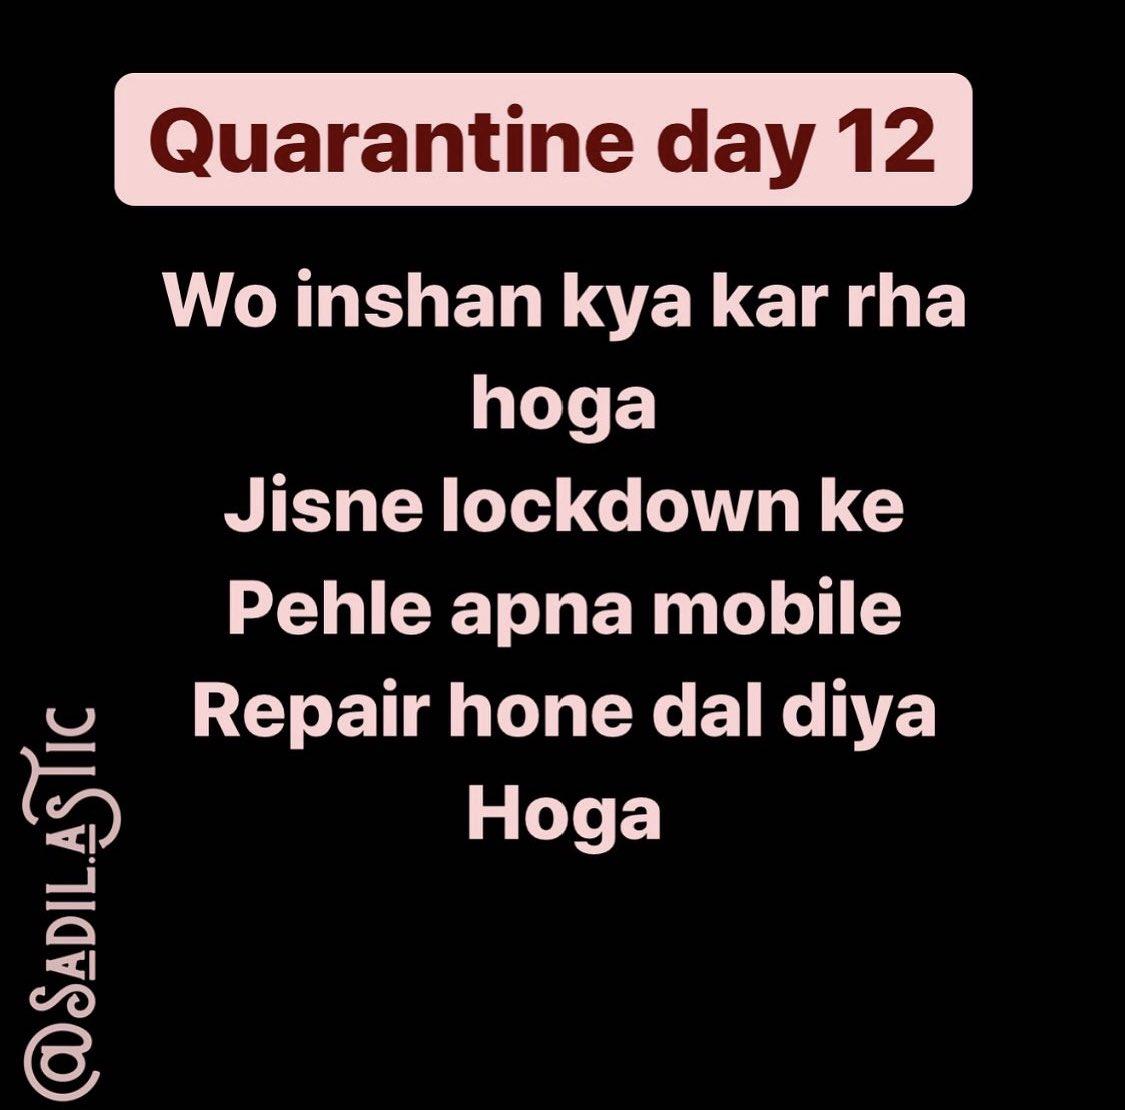 Tag your friends   Follow @sadil.astic for more  #ghanta #trolls_official #hasleyindia #adultgram #idioticsperm #carryminati #ashishchanchlani #bhuvanbam #bbkivines #tharki #bakchod #bakchod_nation #desimeme #desimemes #corona #coronamemes #quarantine #quarantinememes #lockdownpic.twitter.com/g38CEGWvV0